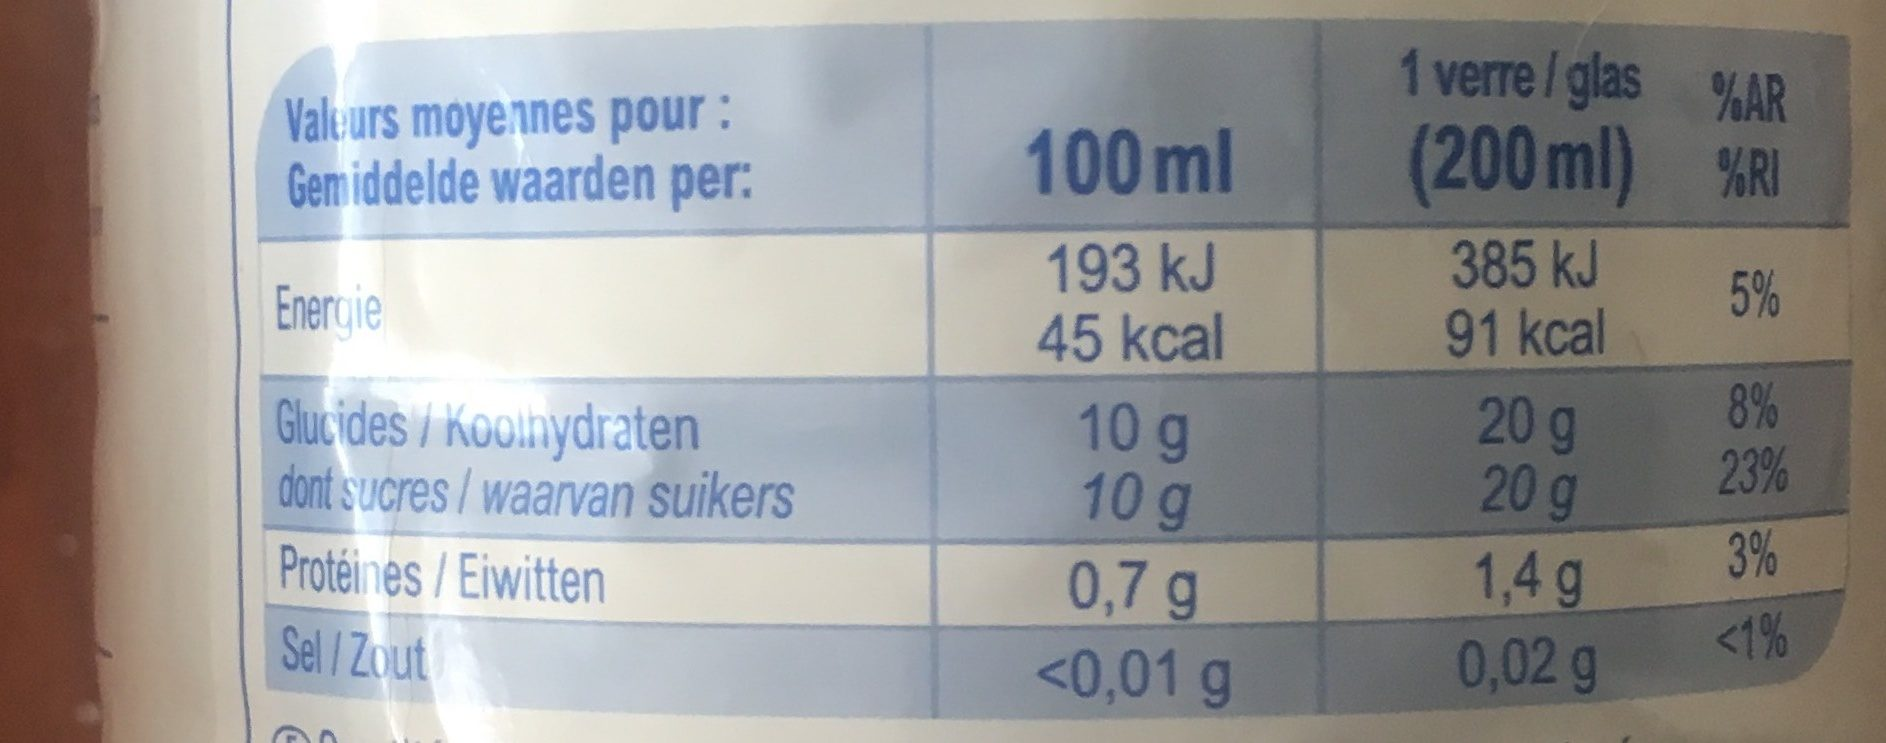 Orange100% Fruit Pressé - Voedingswaarden - fr